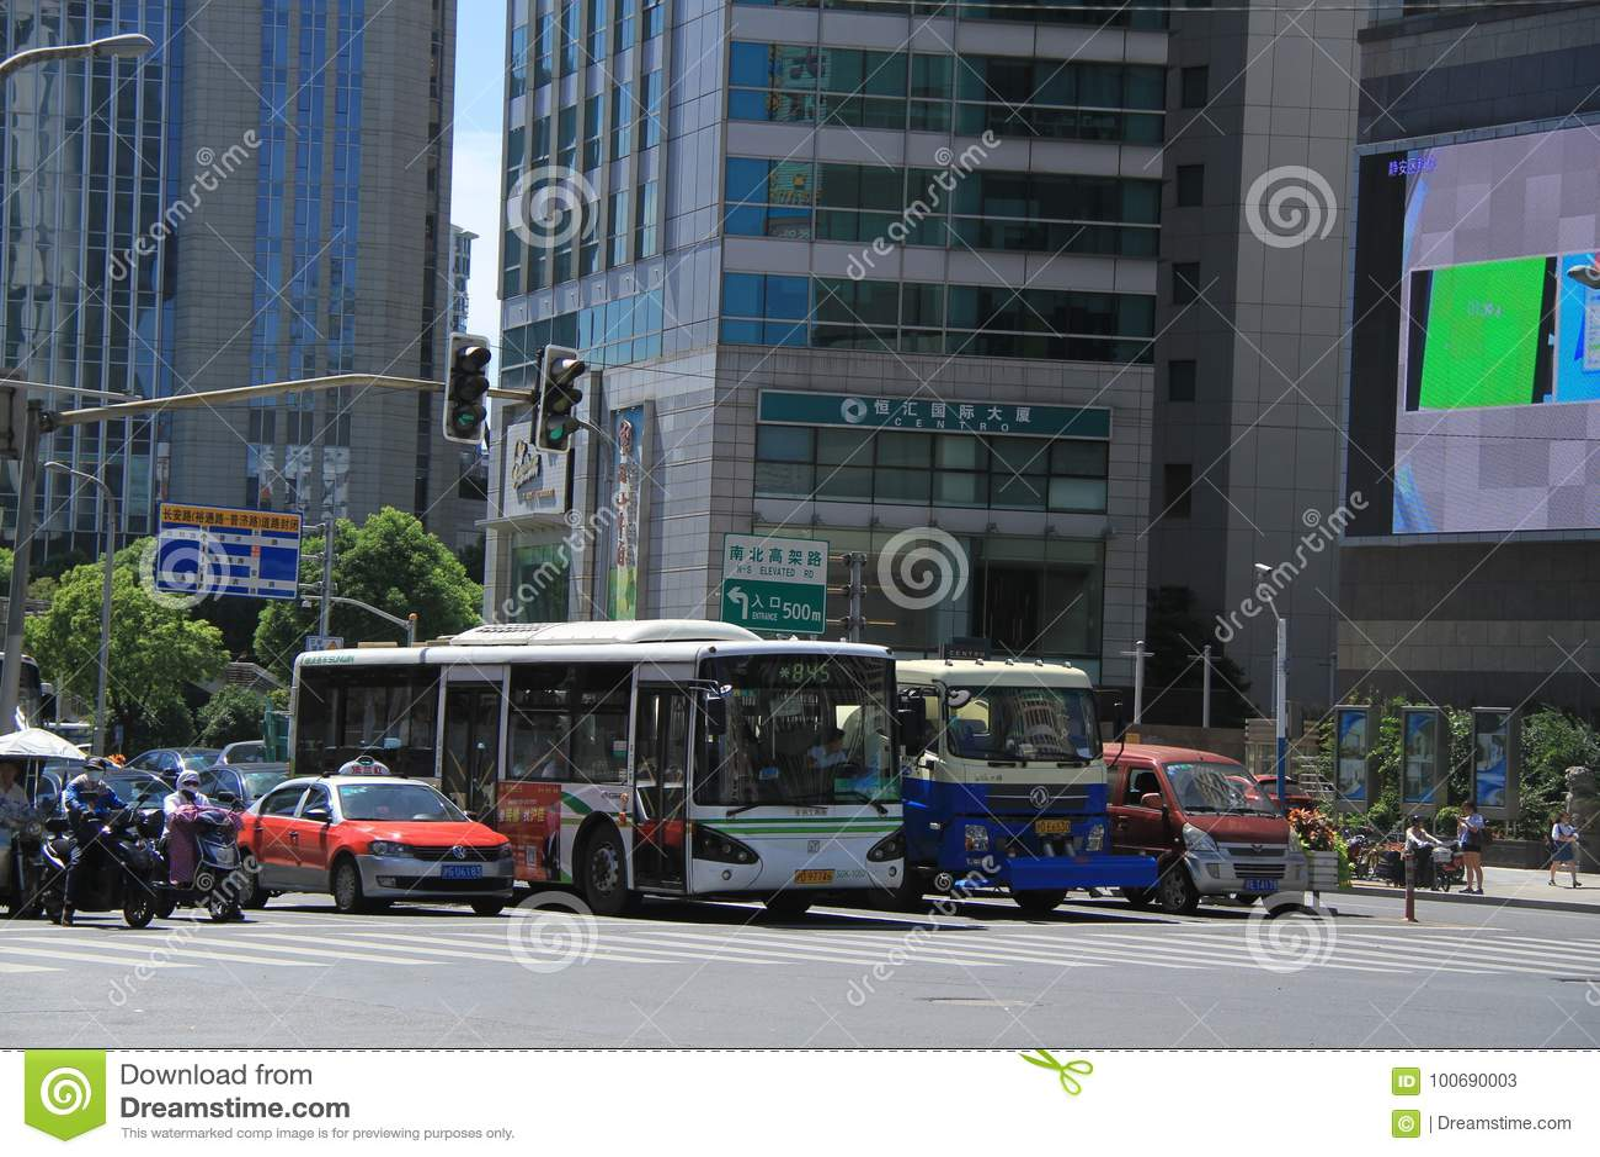 The city of Shanghai